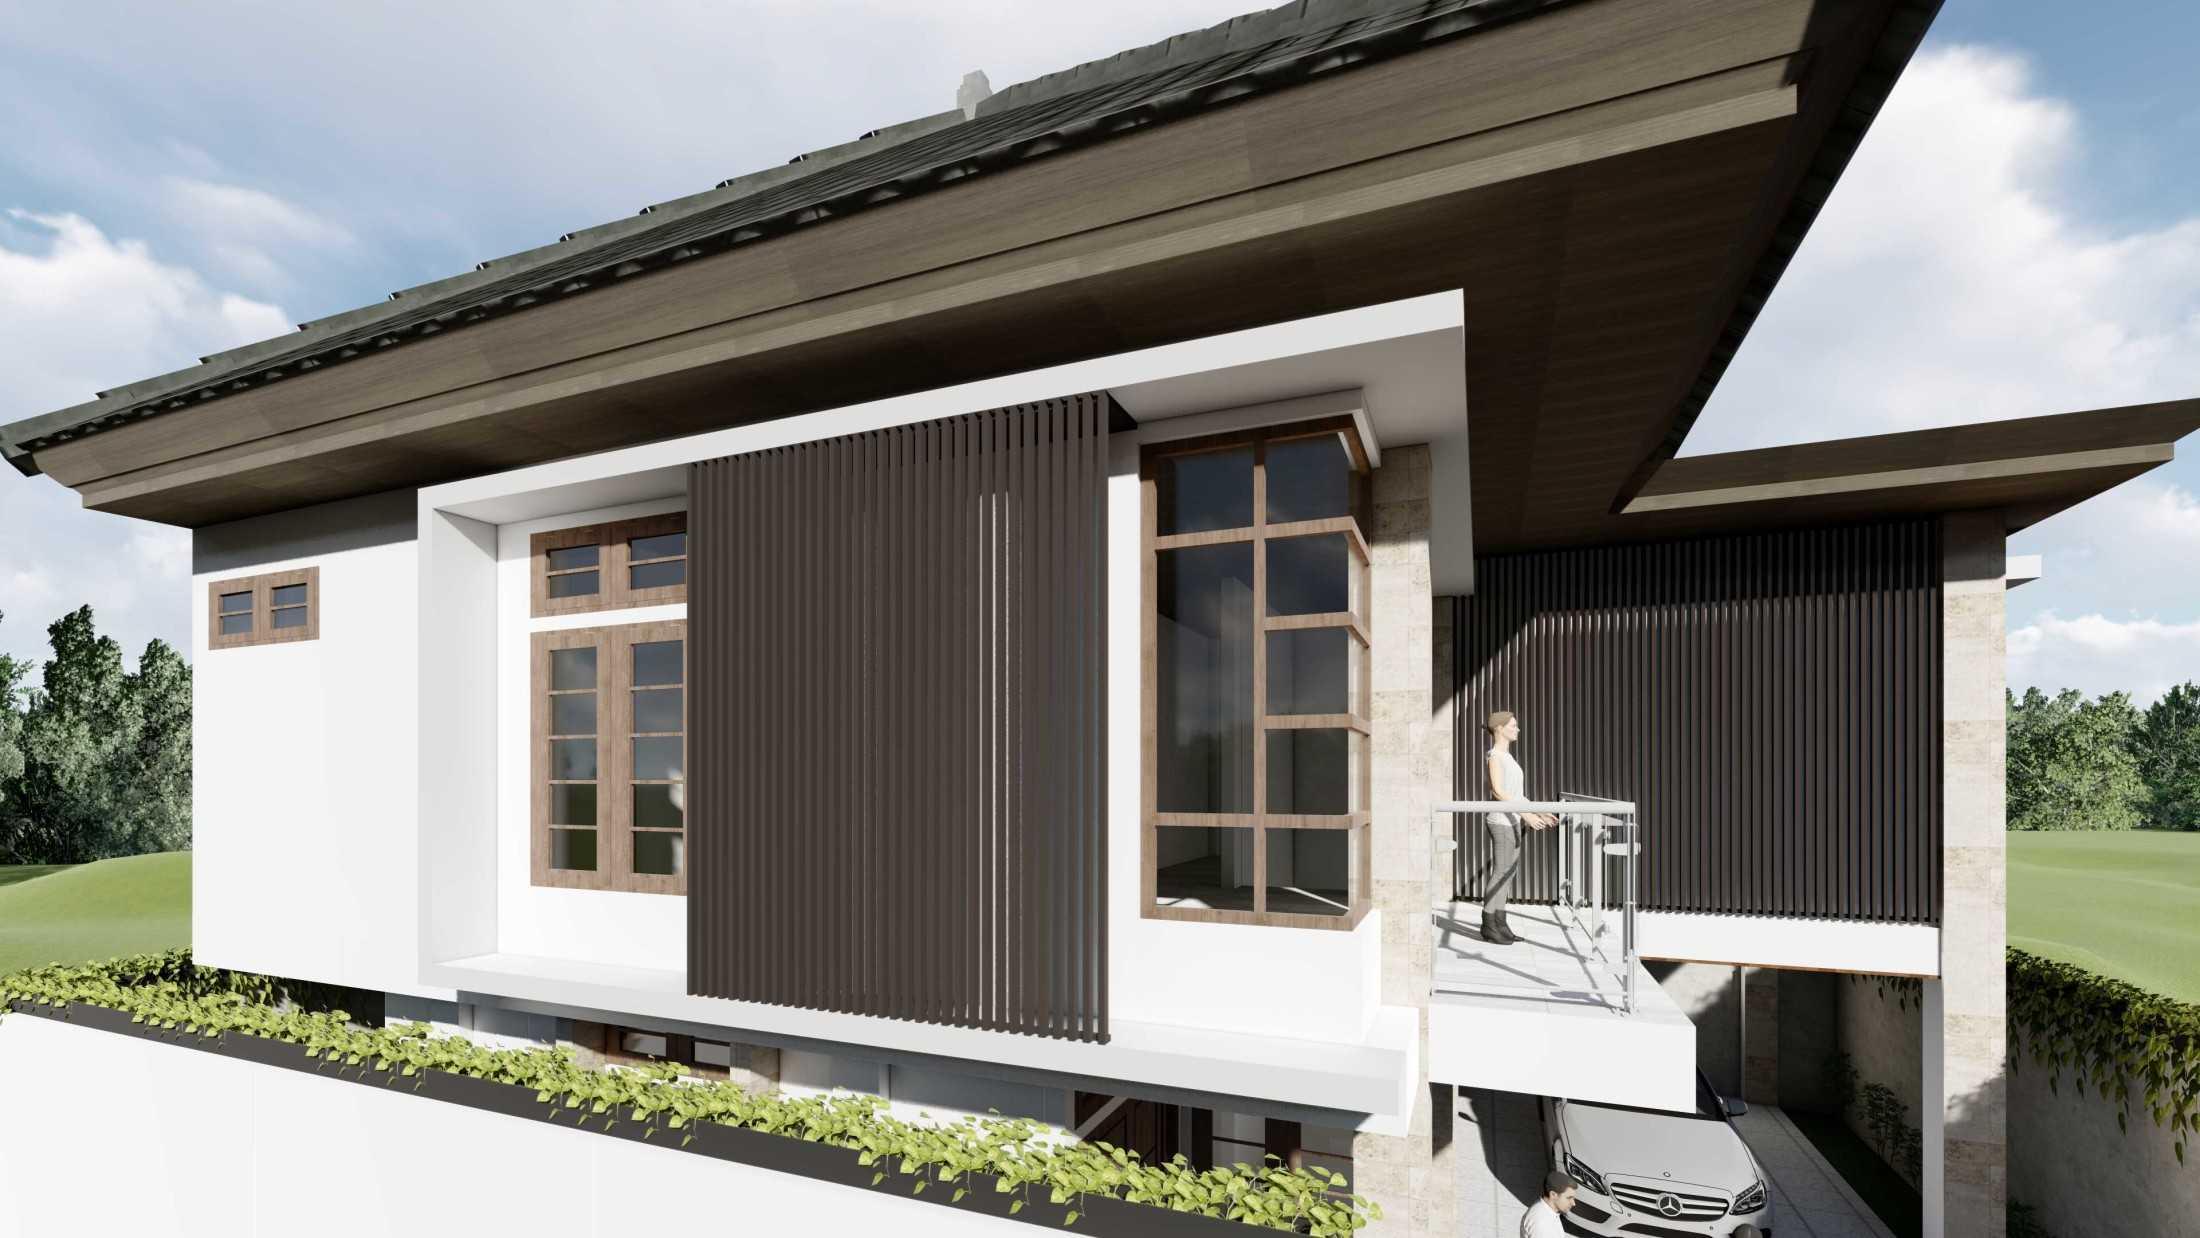 Astabumi Studio Js House Timor Leste Dili, Timor-Leste Pati, Kec. Pati, Kabupaten Pati, Jawa Tengah, Indonesia Cv-Astabumi-Manunggal-Prakarsa-Js-House-Timor-Leste  119265